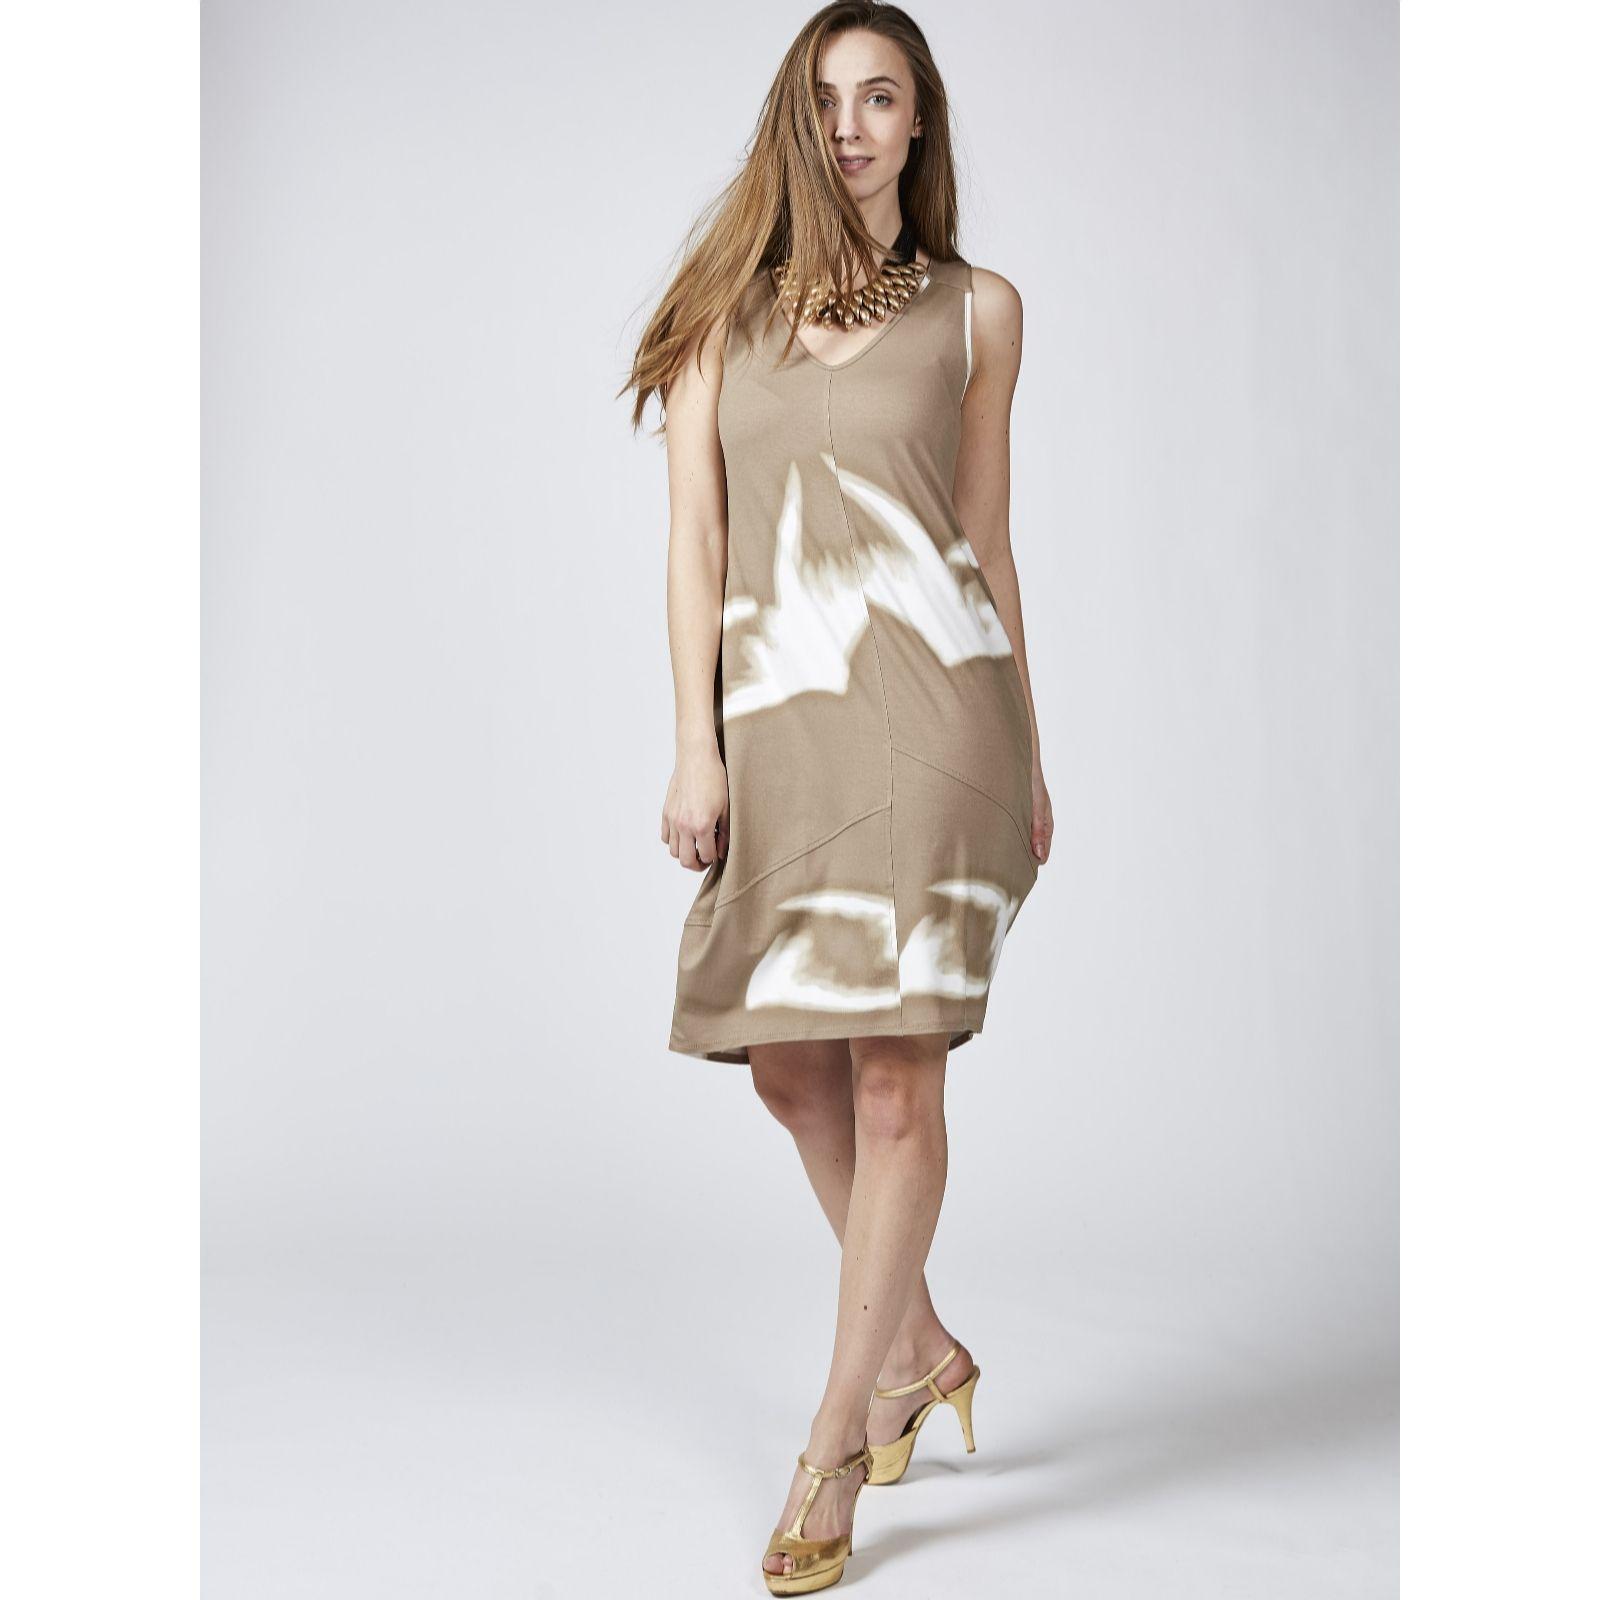 Molton Brown Bath And Shower Marlawynne Printed Jersey Sleeveless Dress Qvc Uk